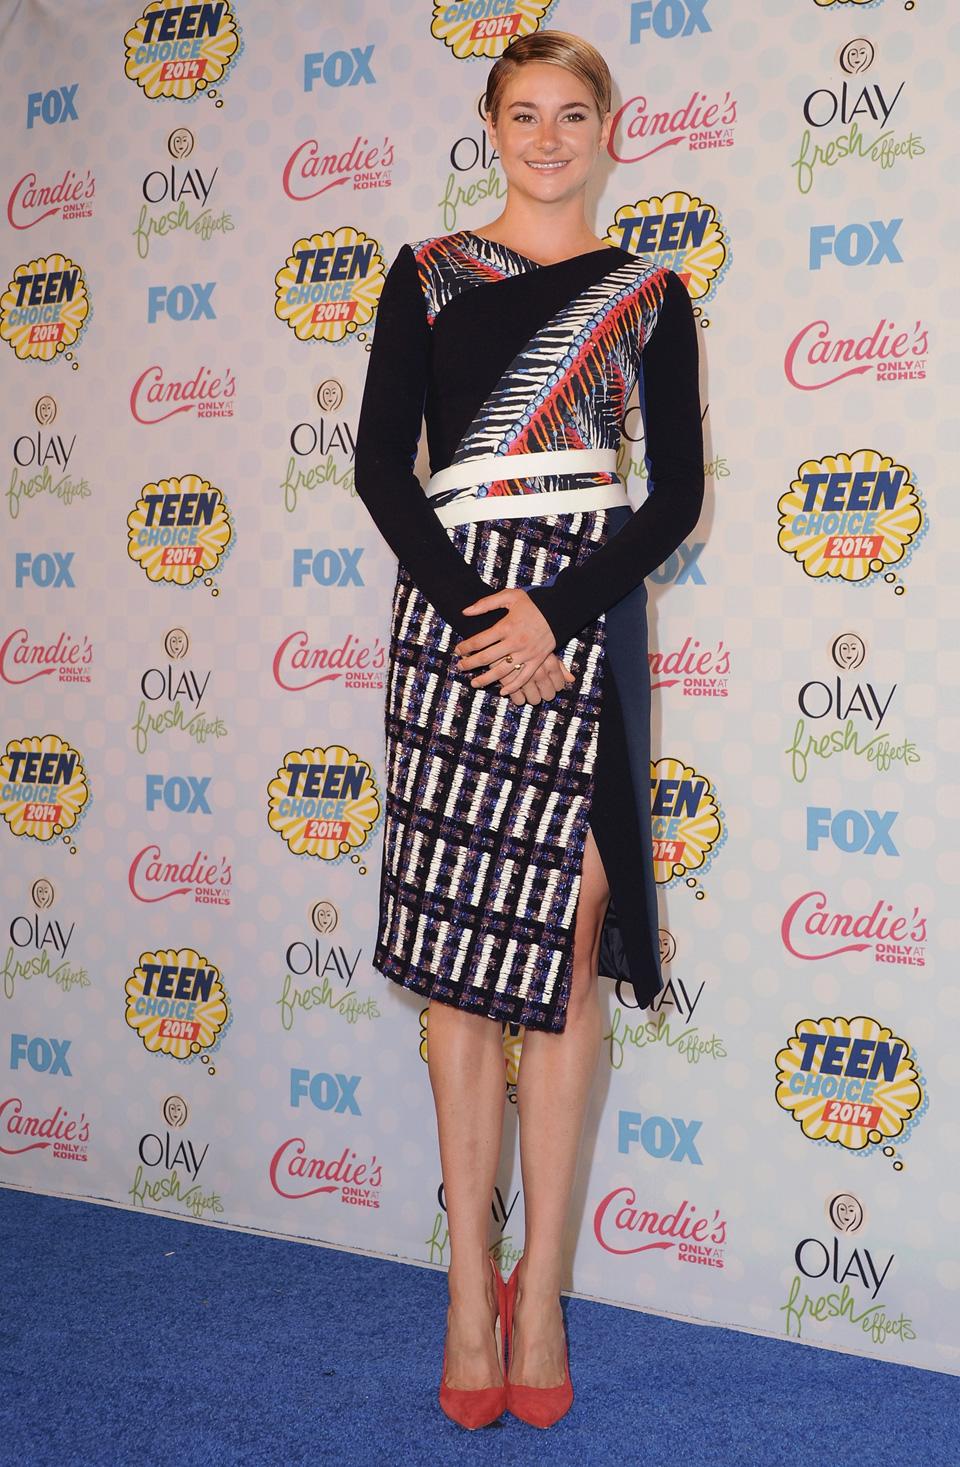 Shailene Woodleyat the 2014 Teen Choice Awards